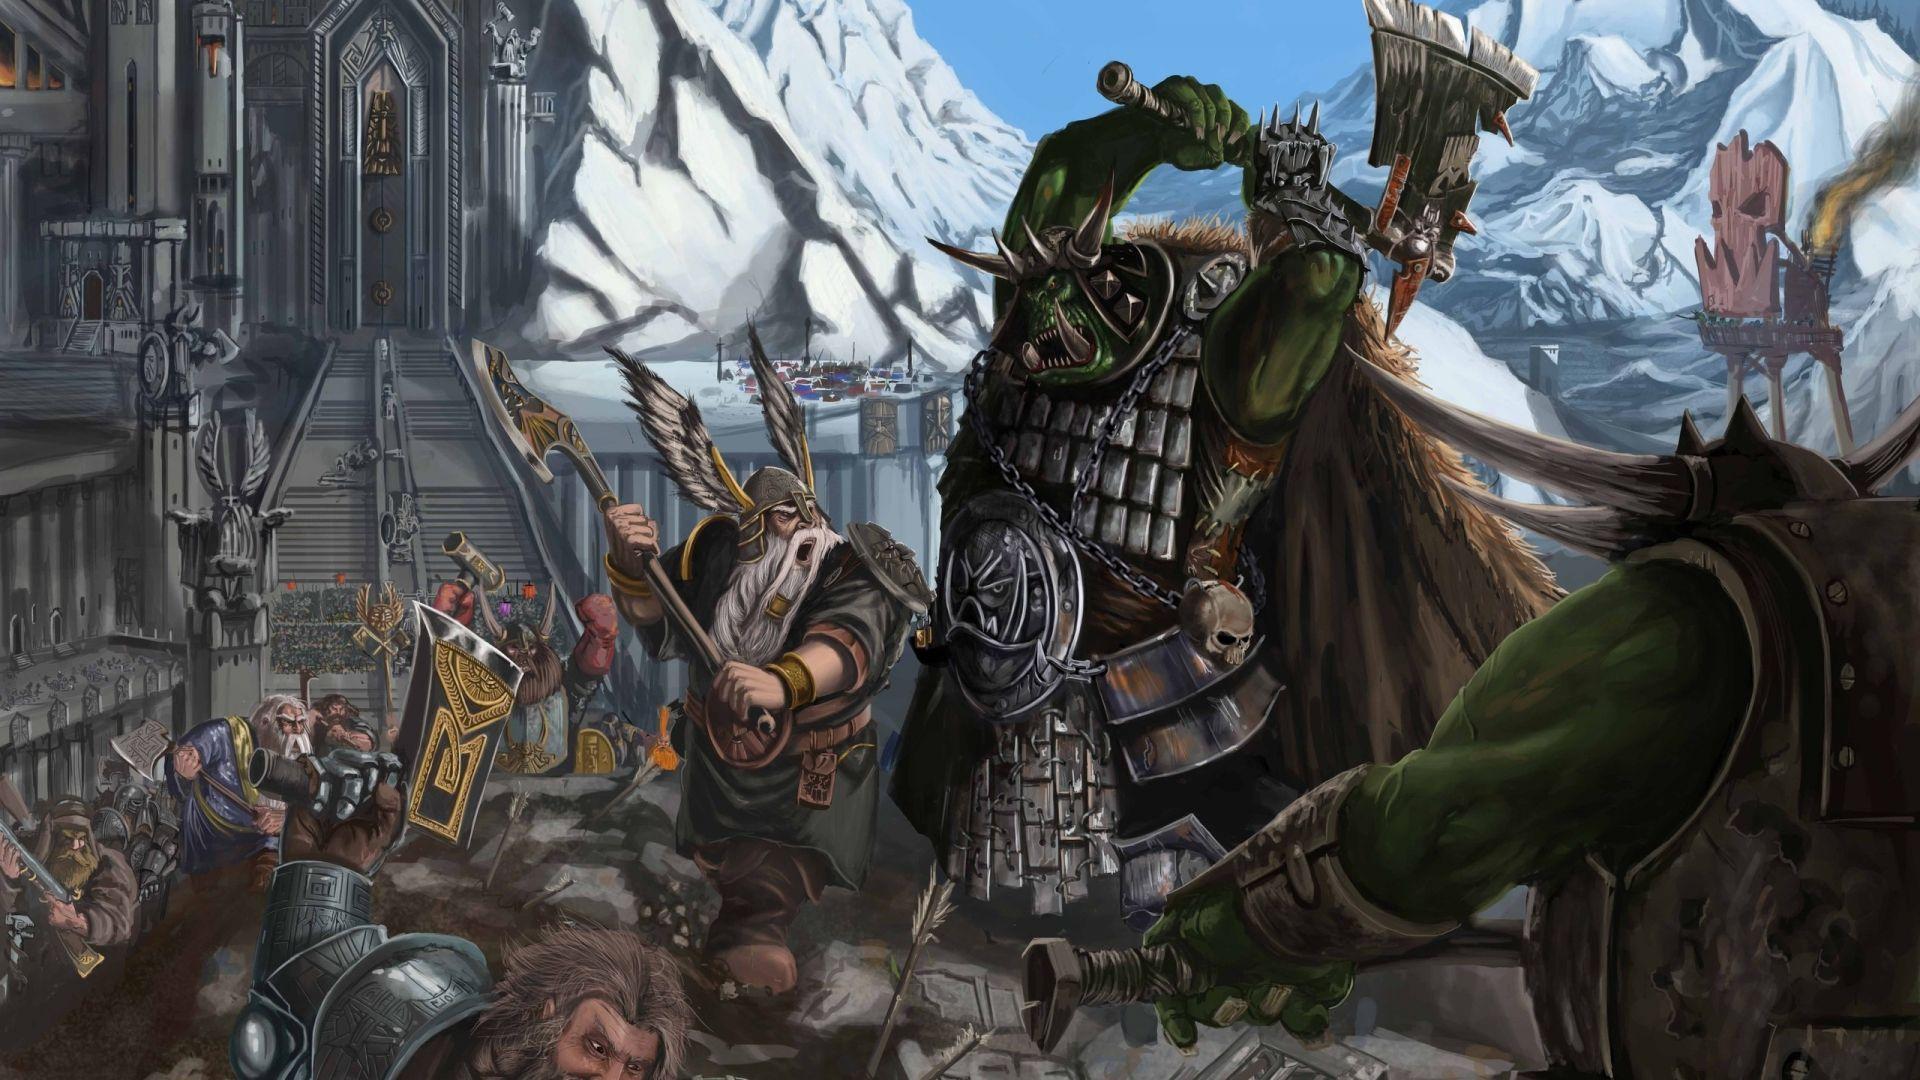 Warhammer Fantasy Wallpapers - Wallpaper Cave